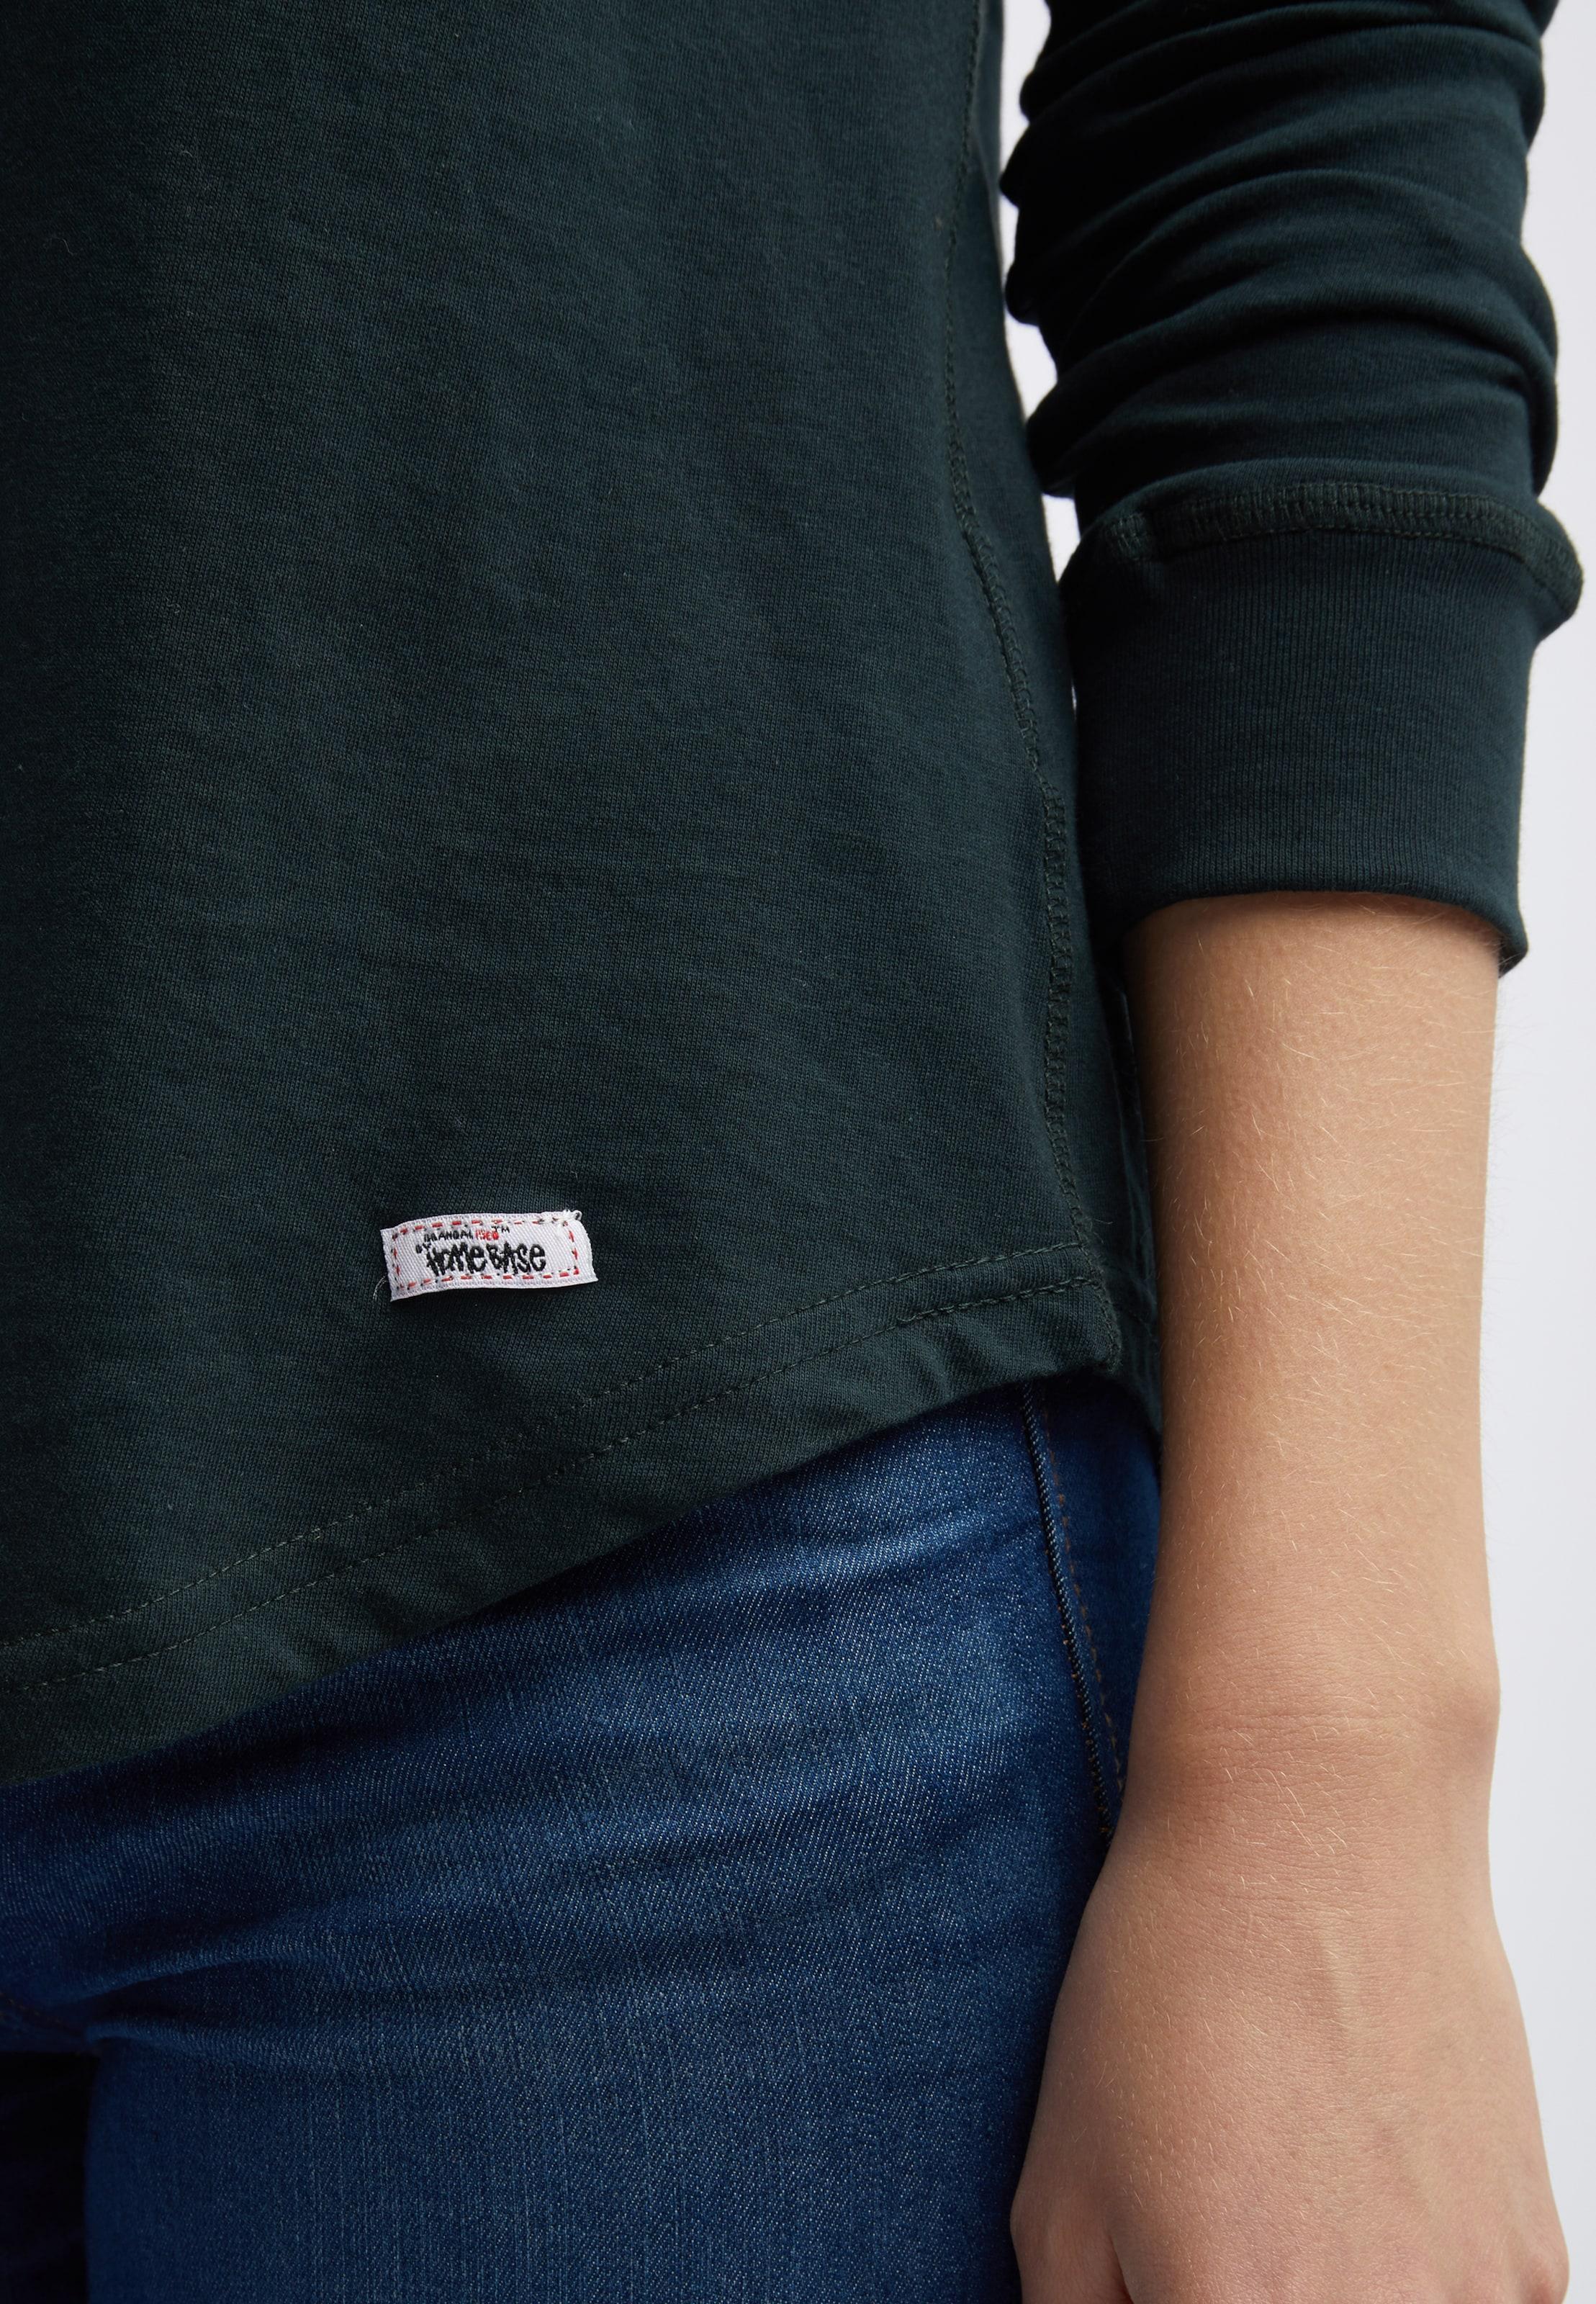 Vert En T shirt Homebase Foncé OP80nwk